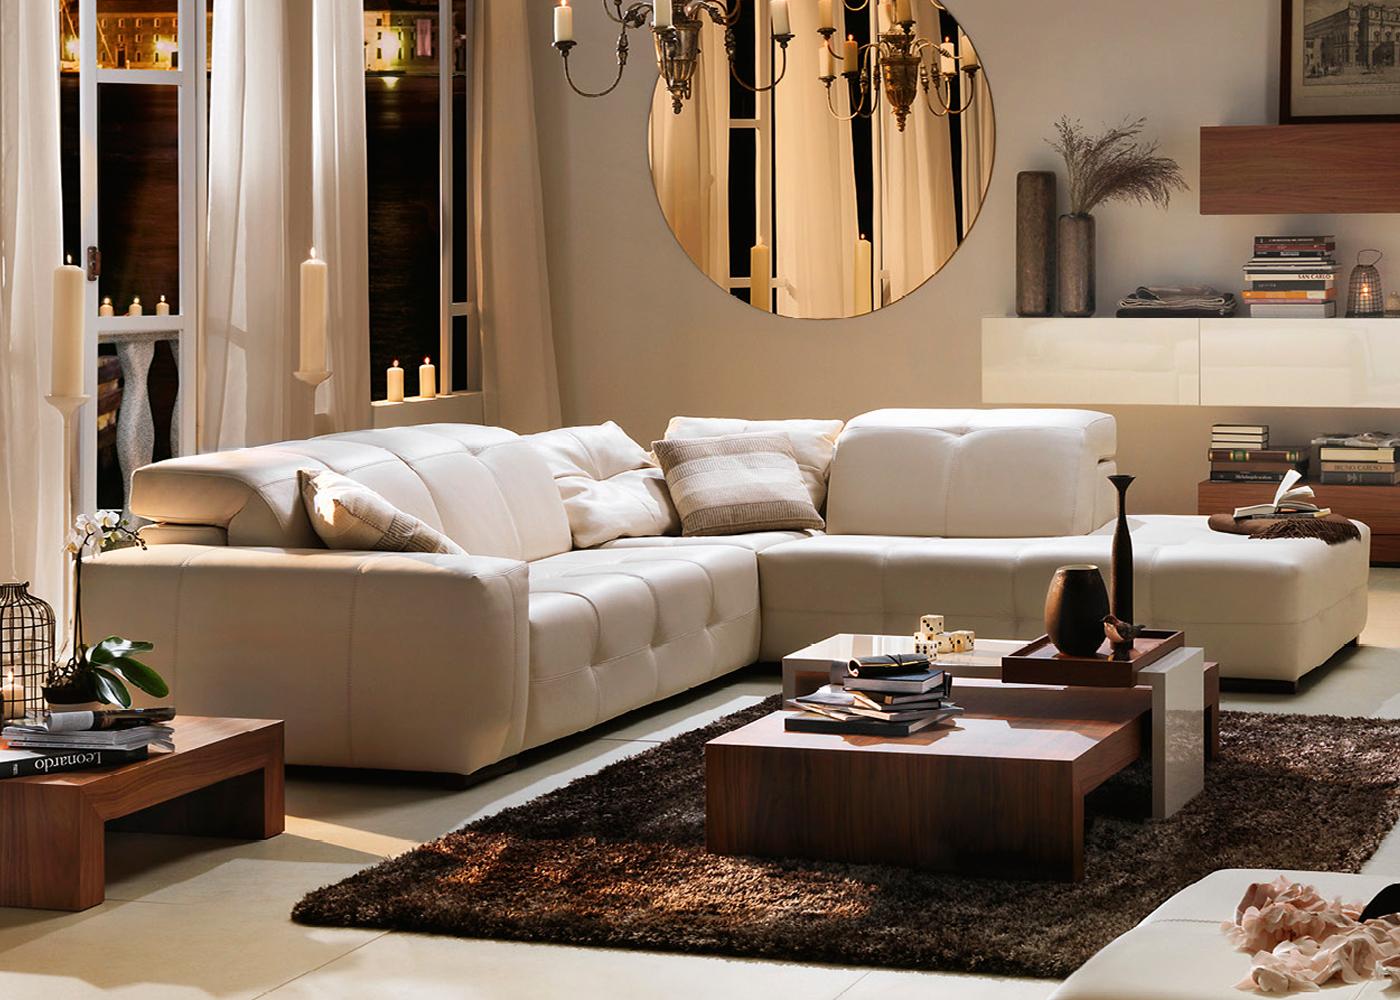 Natuzzi Surround Sofa Midfurn Furniture Superstore